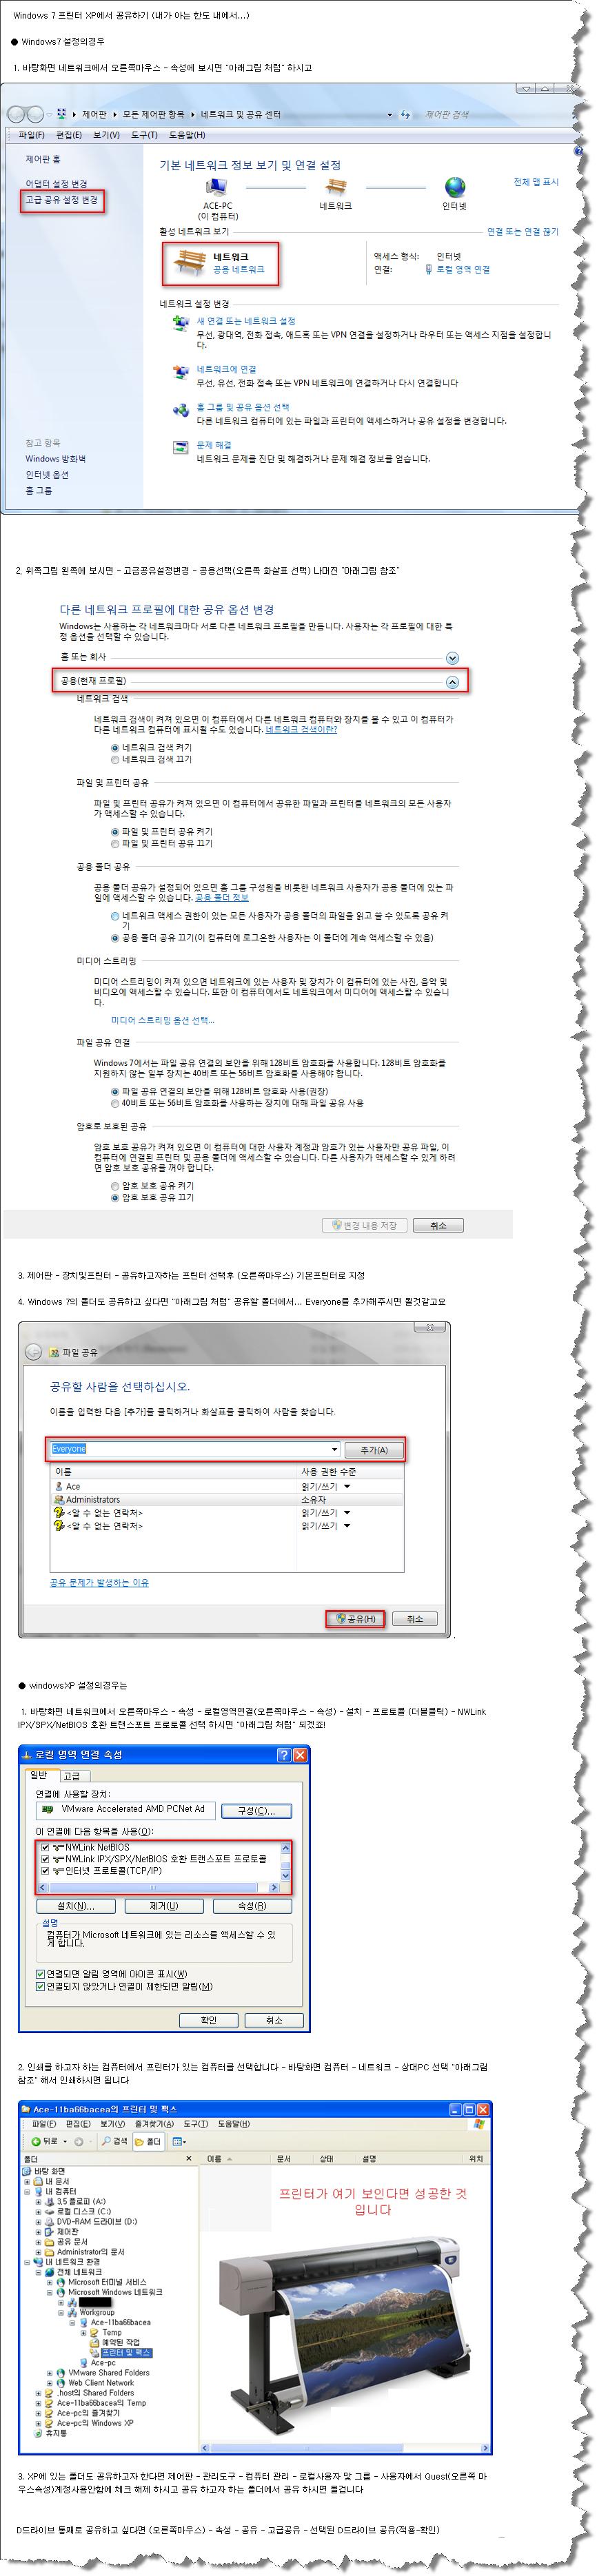 Win7 과 XP 프린터와 파일 서로 공유하기.jpg